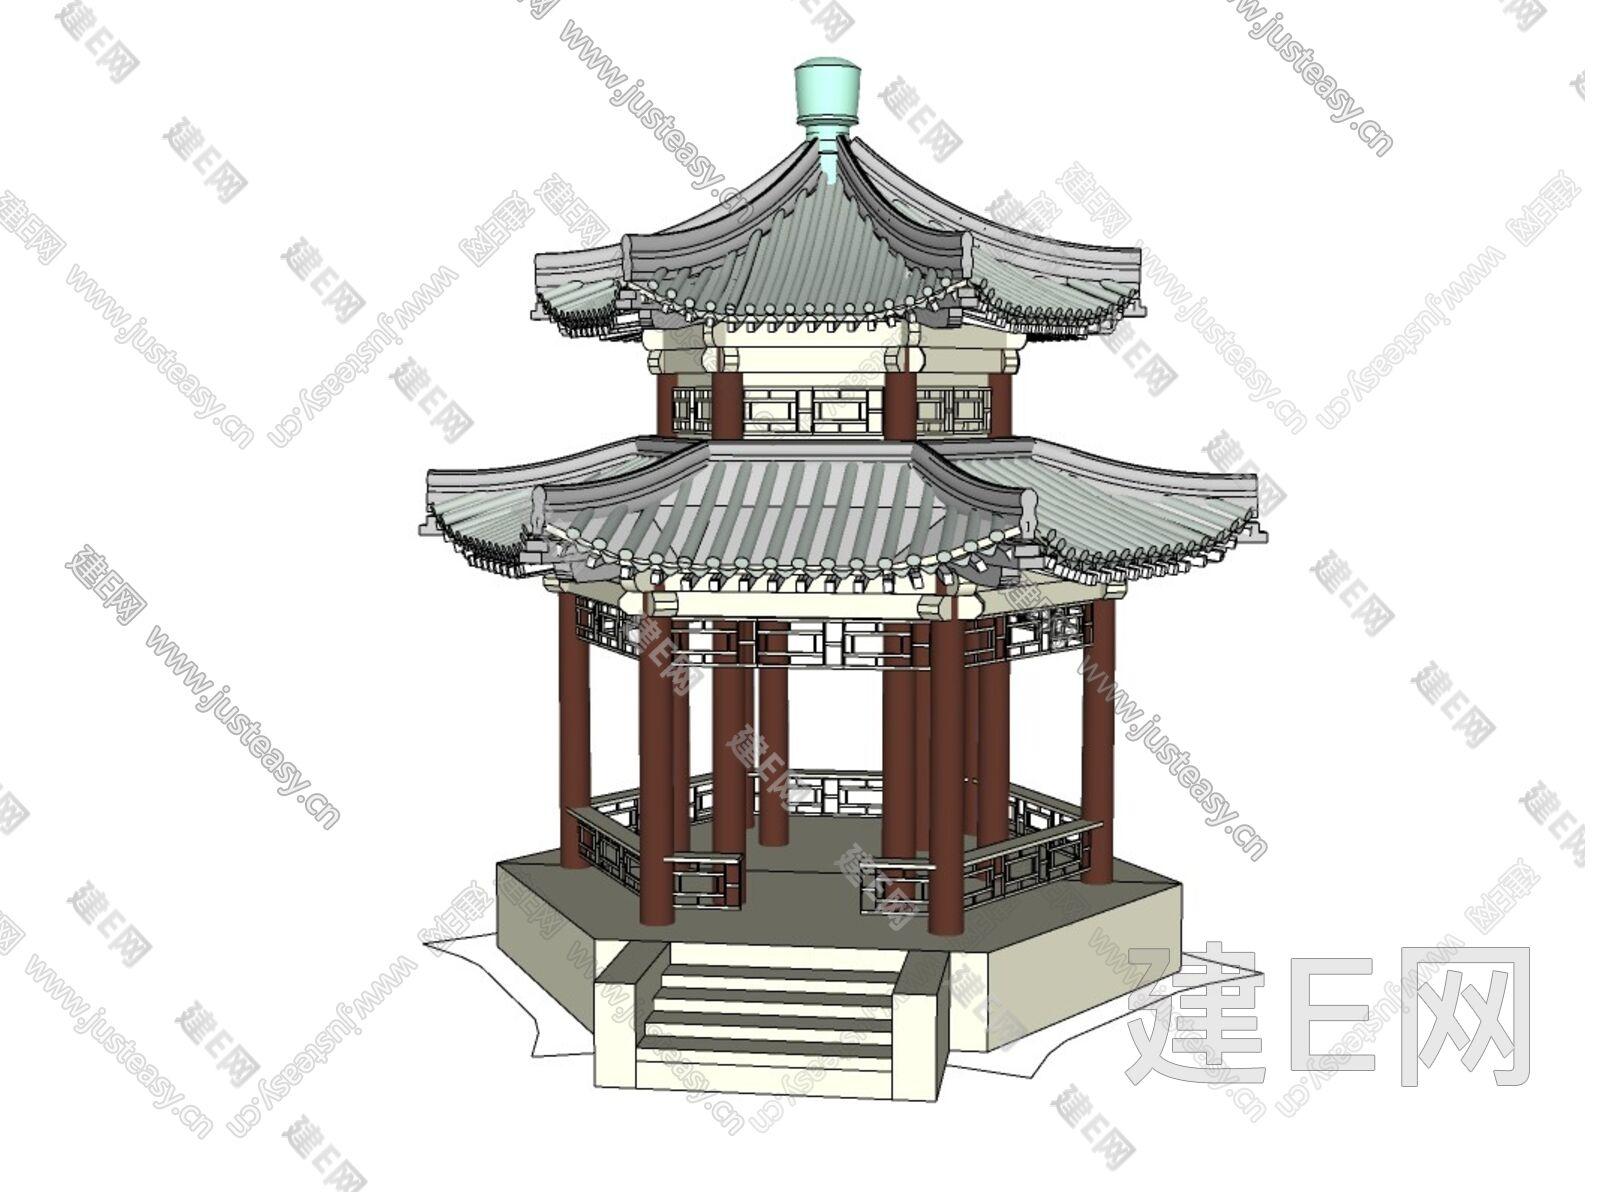 重檐6角亭sketchup模型